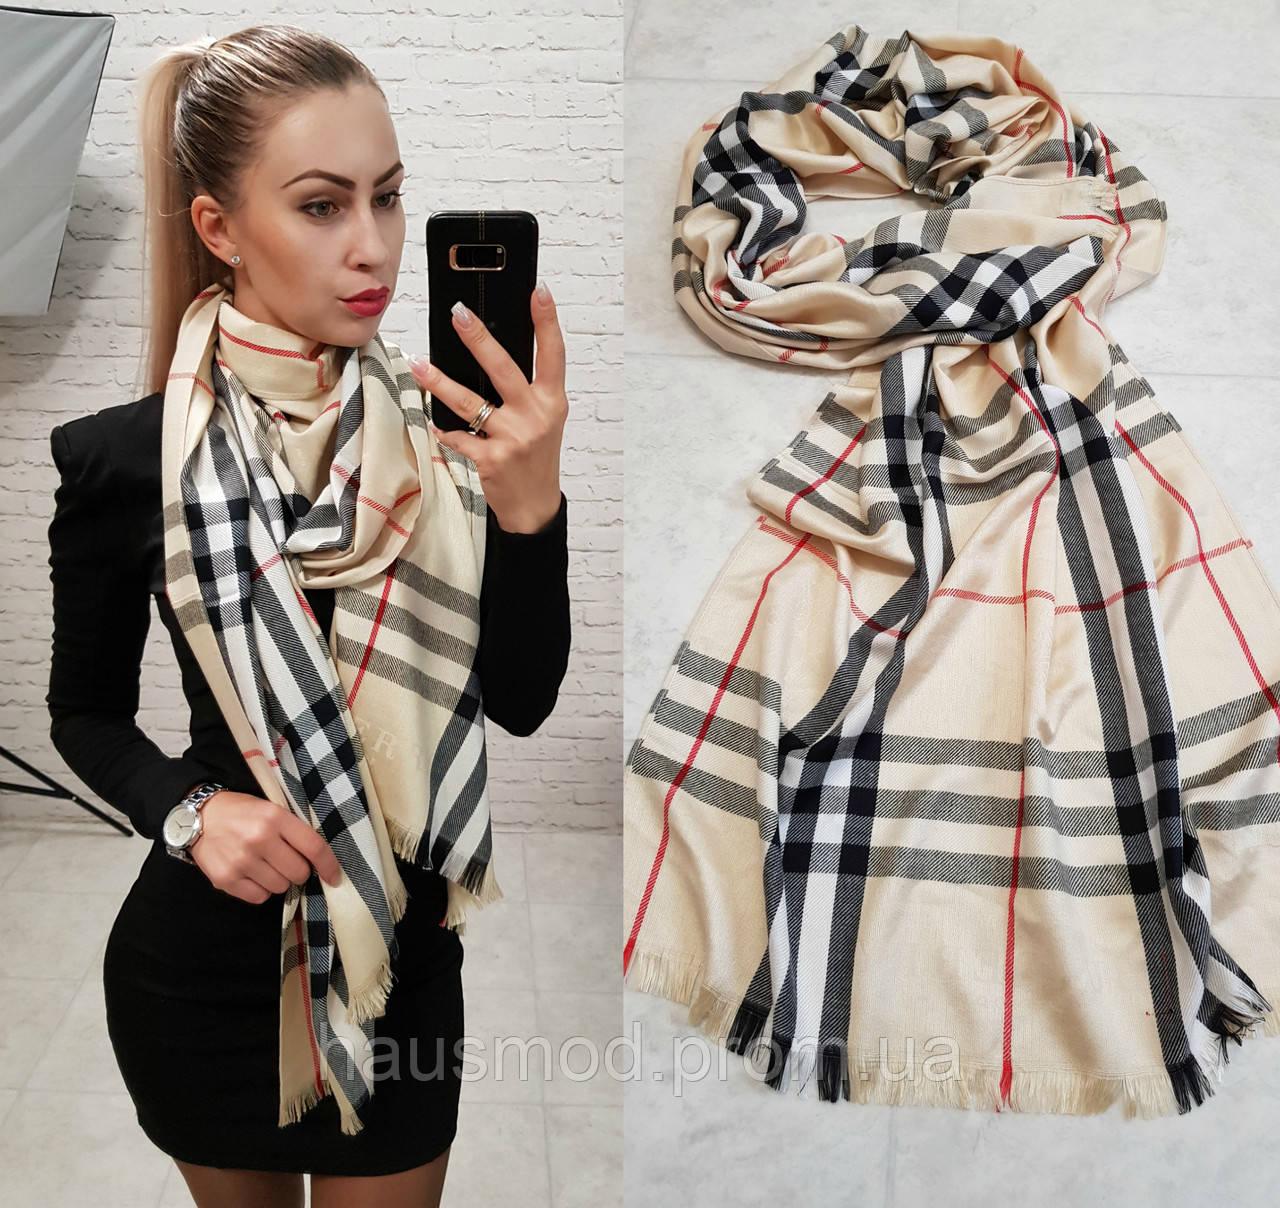 Палантин шарф брендовый реплика Burberry беж